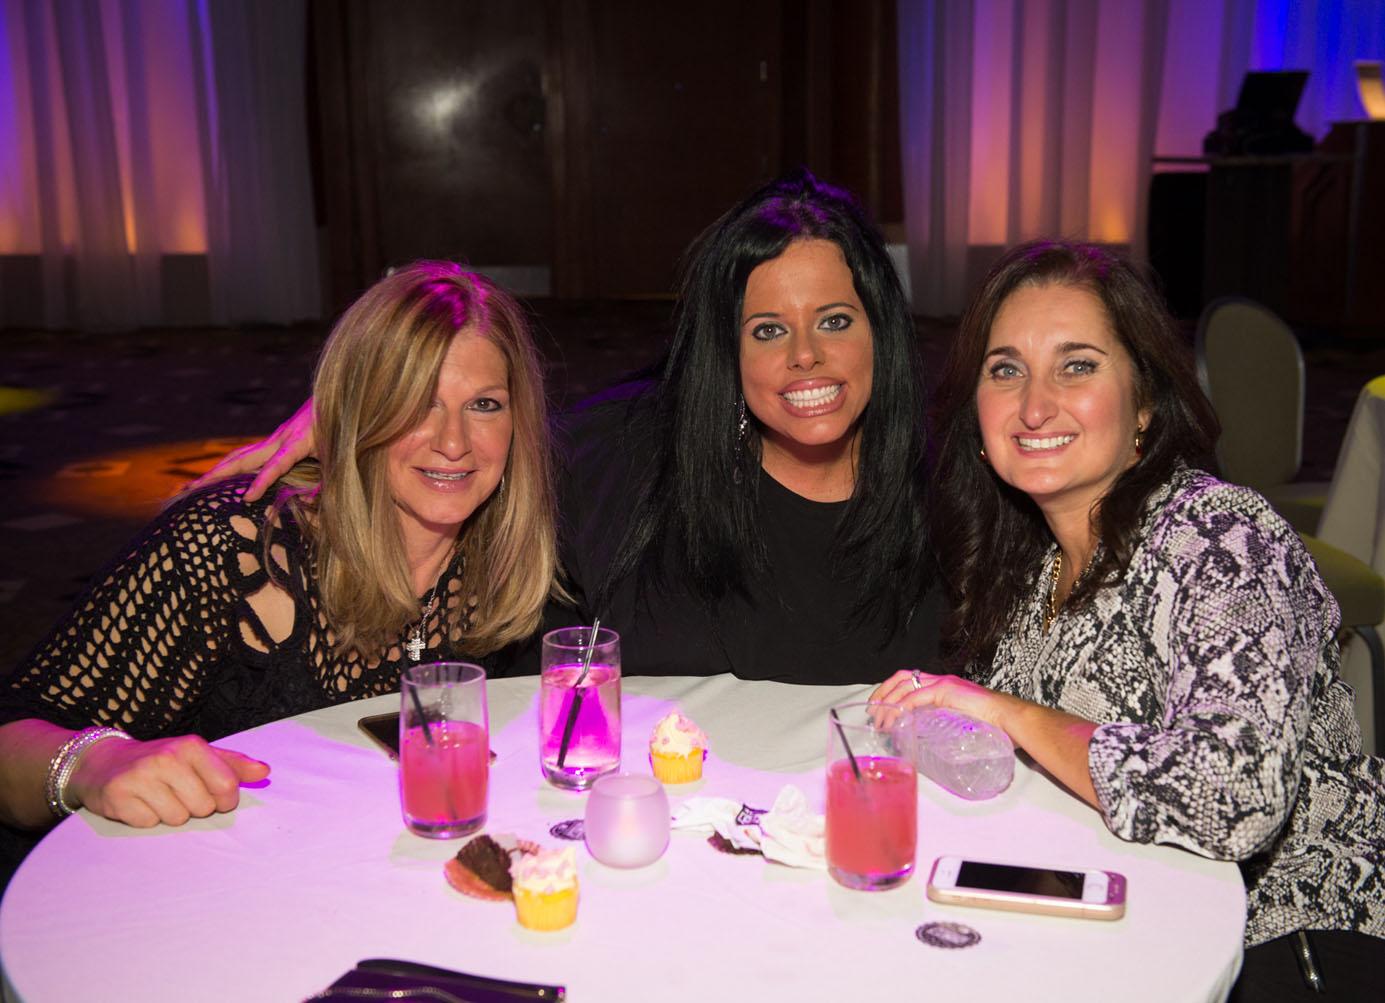 2015-12-09 ReMax Corpoarte Event - The Borgata - Atlantic City NJ - Photo Sesh - 2015-5064.jpg